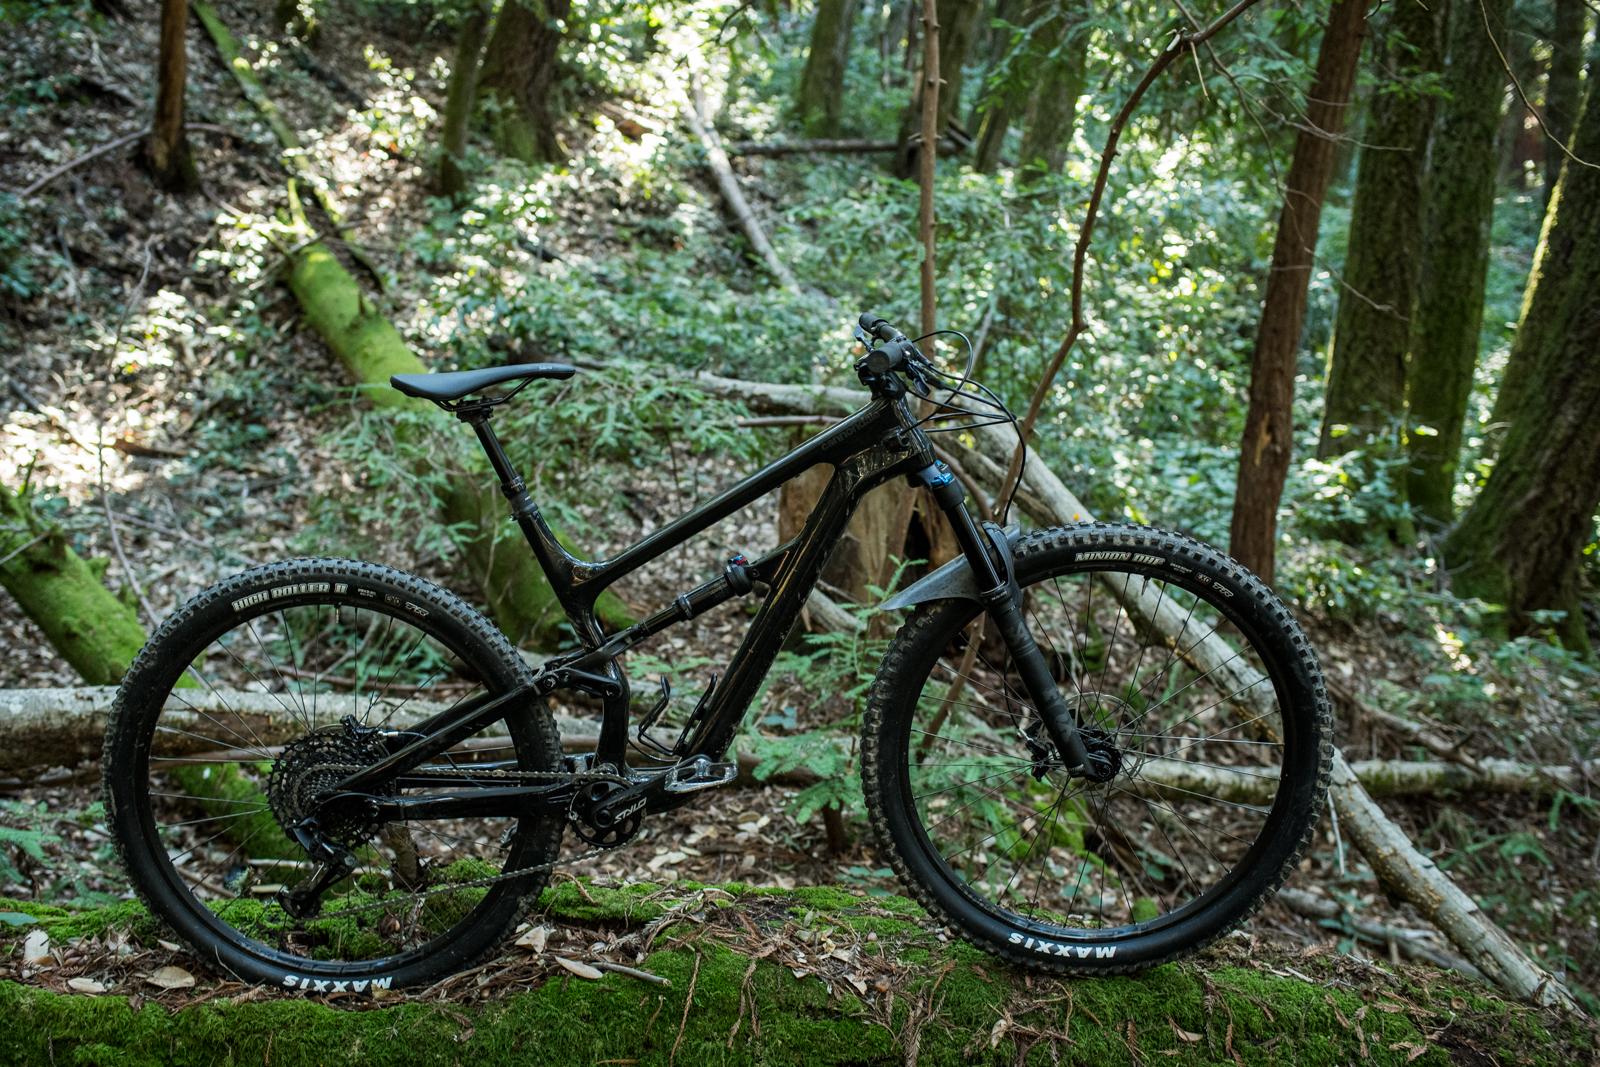 b05f575a377 MTB-MAG.COM - Mountain Bike Magazine | [Tested] Cannondale Habit ...